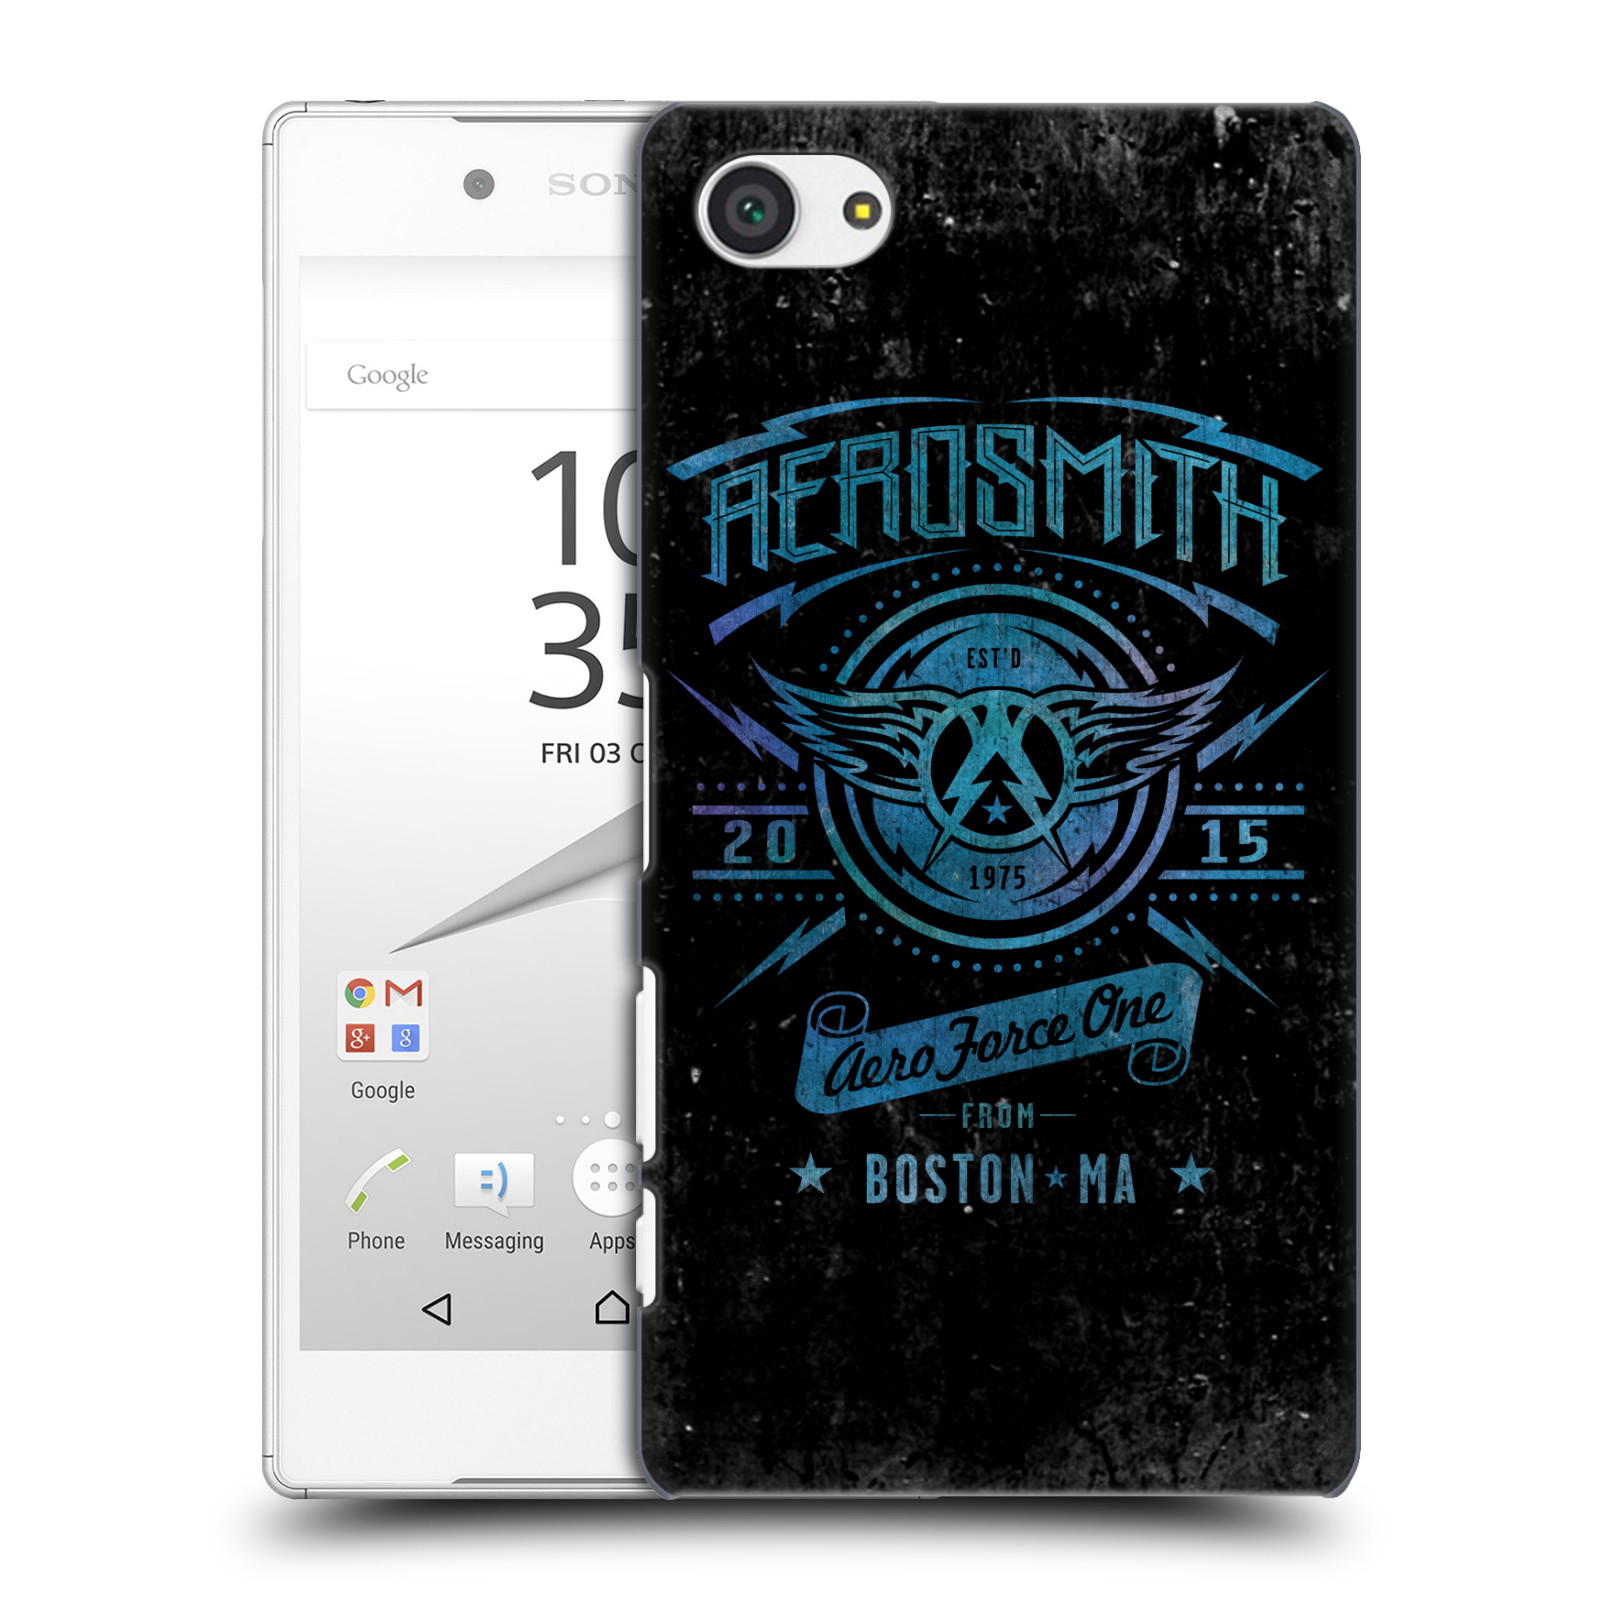 Plastové pouzdro na mobil Sony Xperia Z5 Compact HEAD CASE - Aerosmith - Aero Force One